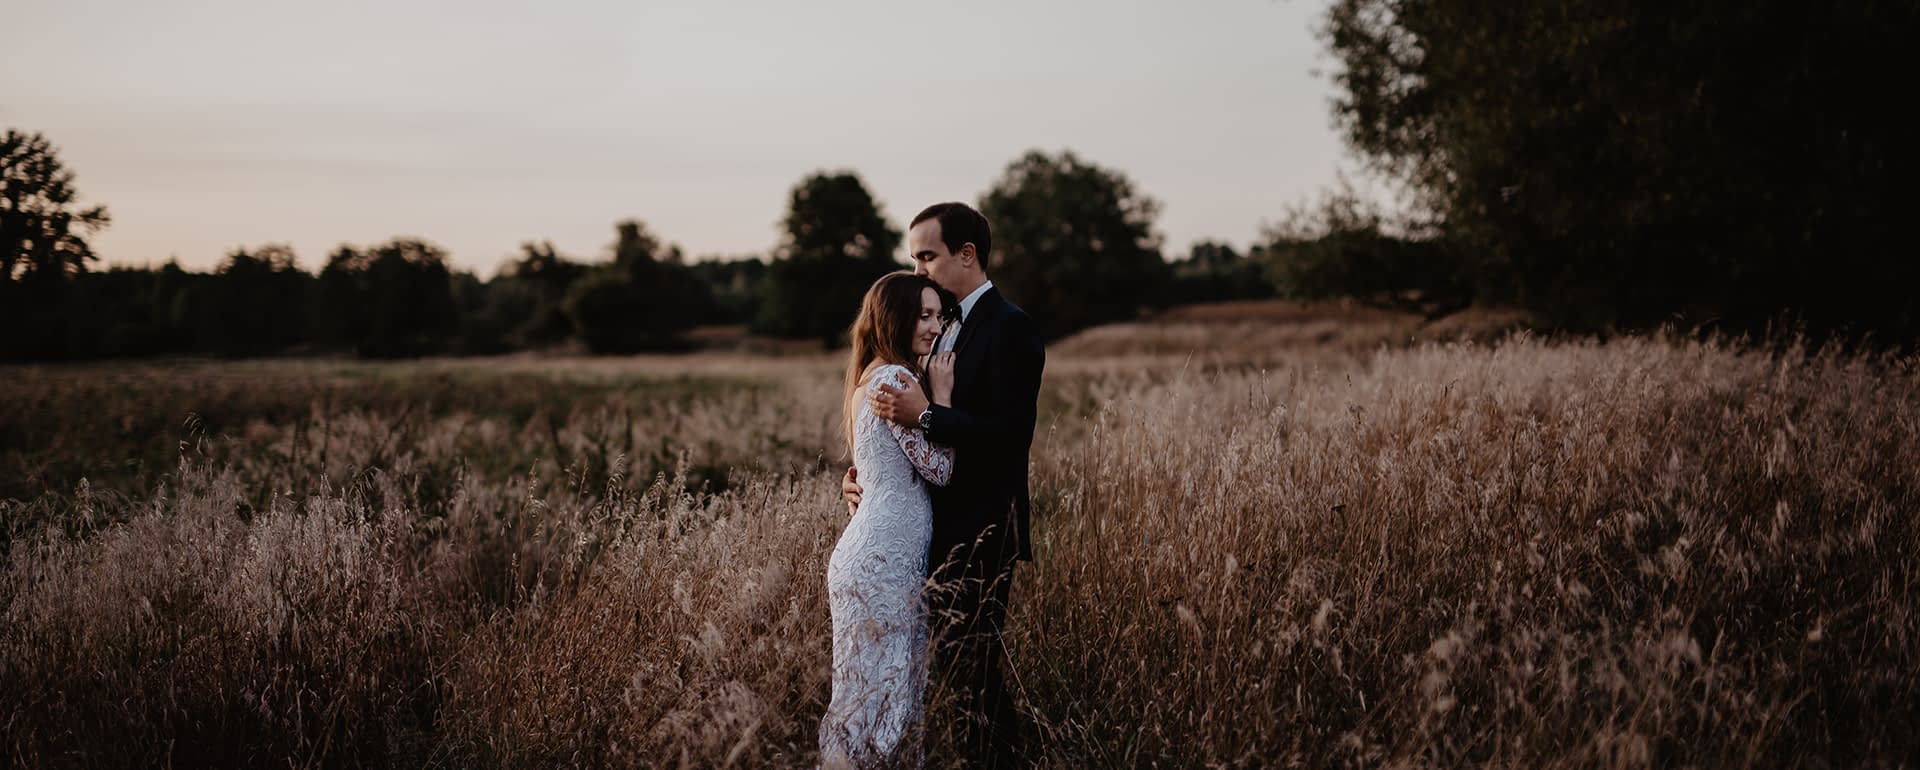 Updated 22/09: Will the Coronavirus Affect My Wedding Planning?